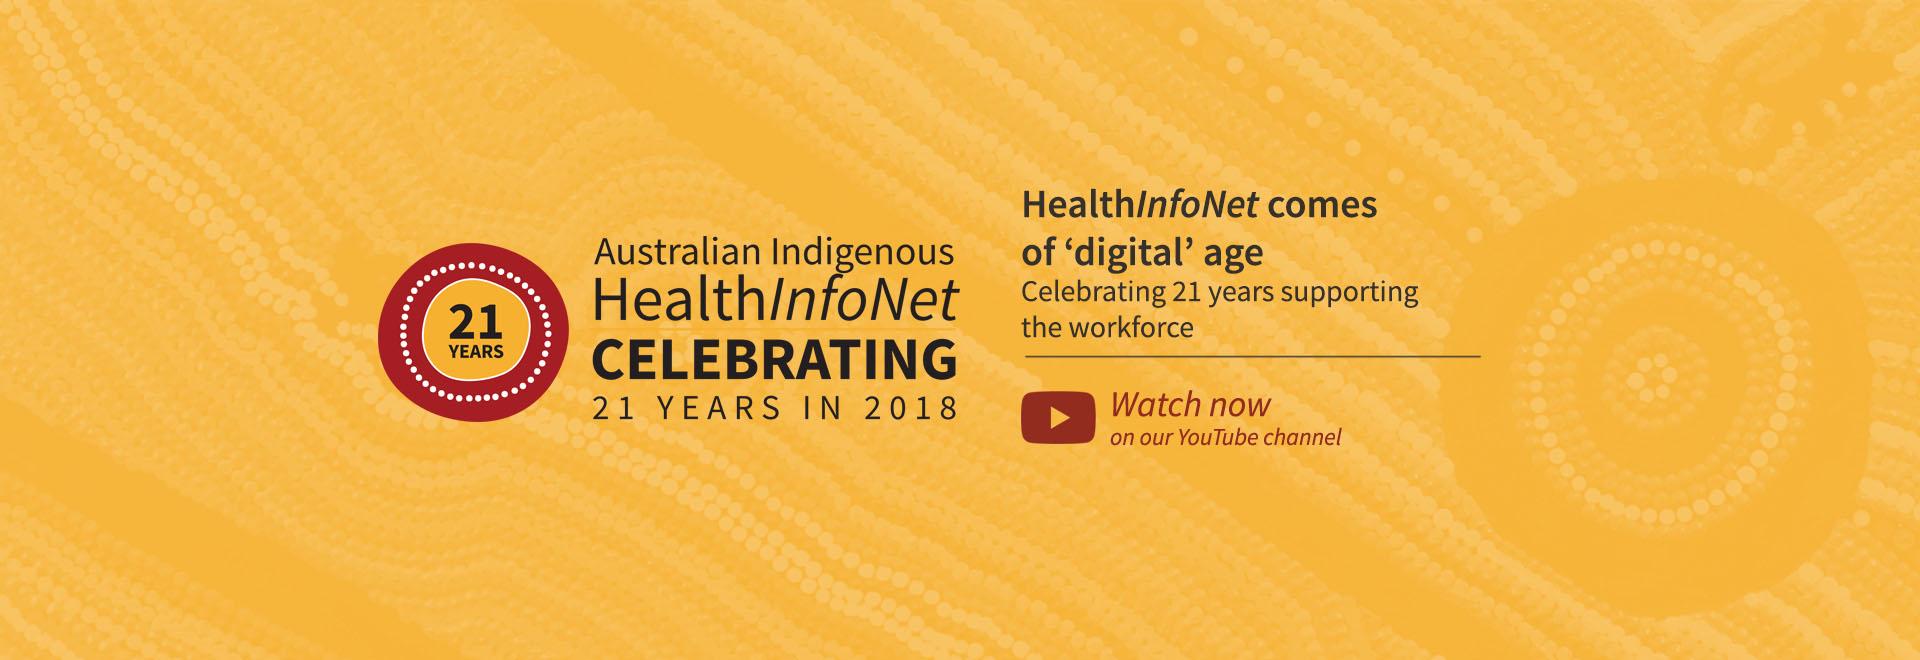 HealthInfoNet - Celebrating 21 years